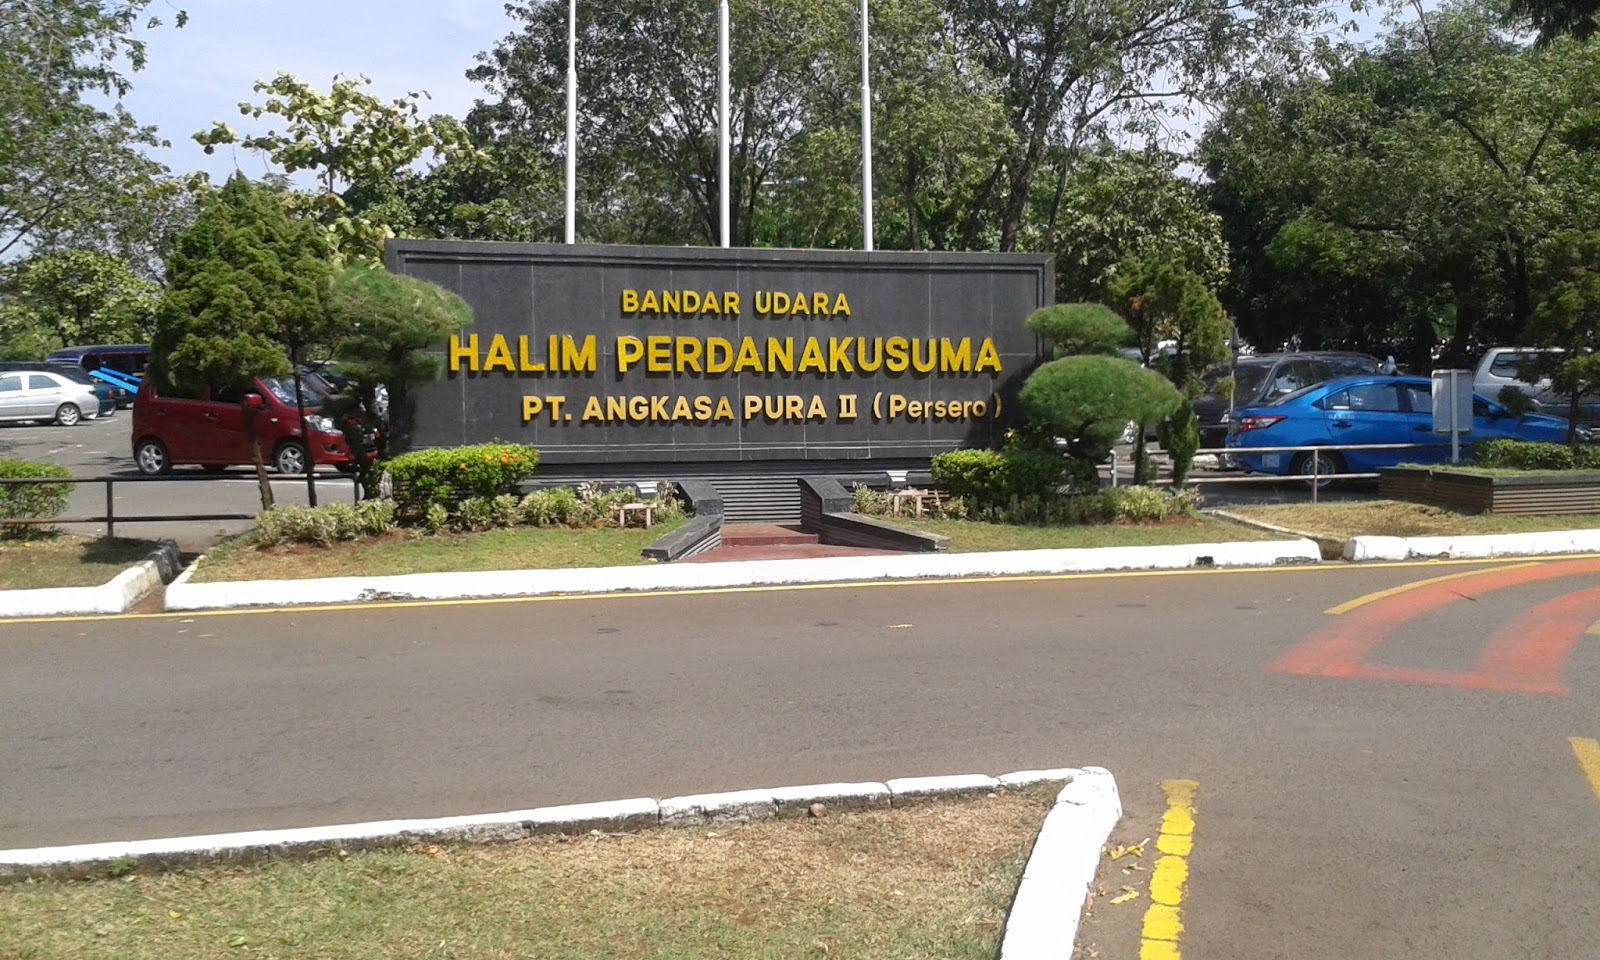 Image result for bandara halim perdana kusuma